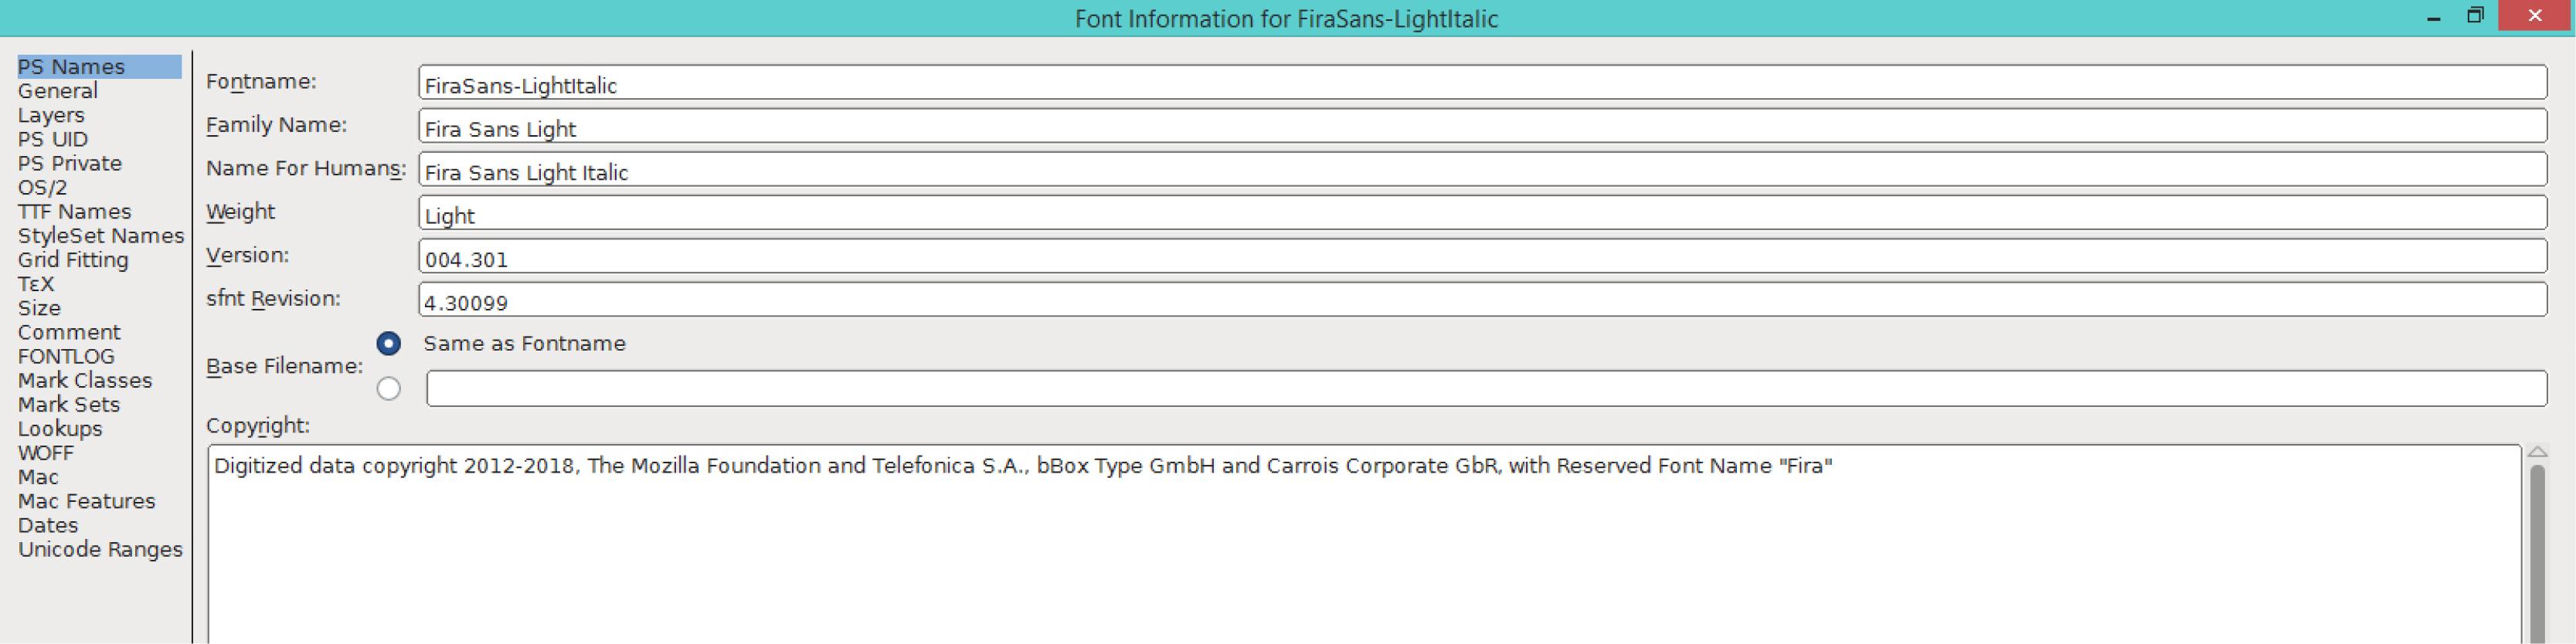 Fira Sans Light Italic (PS)